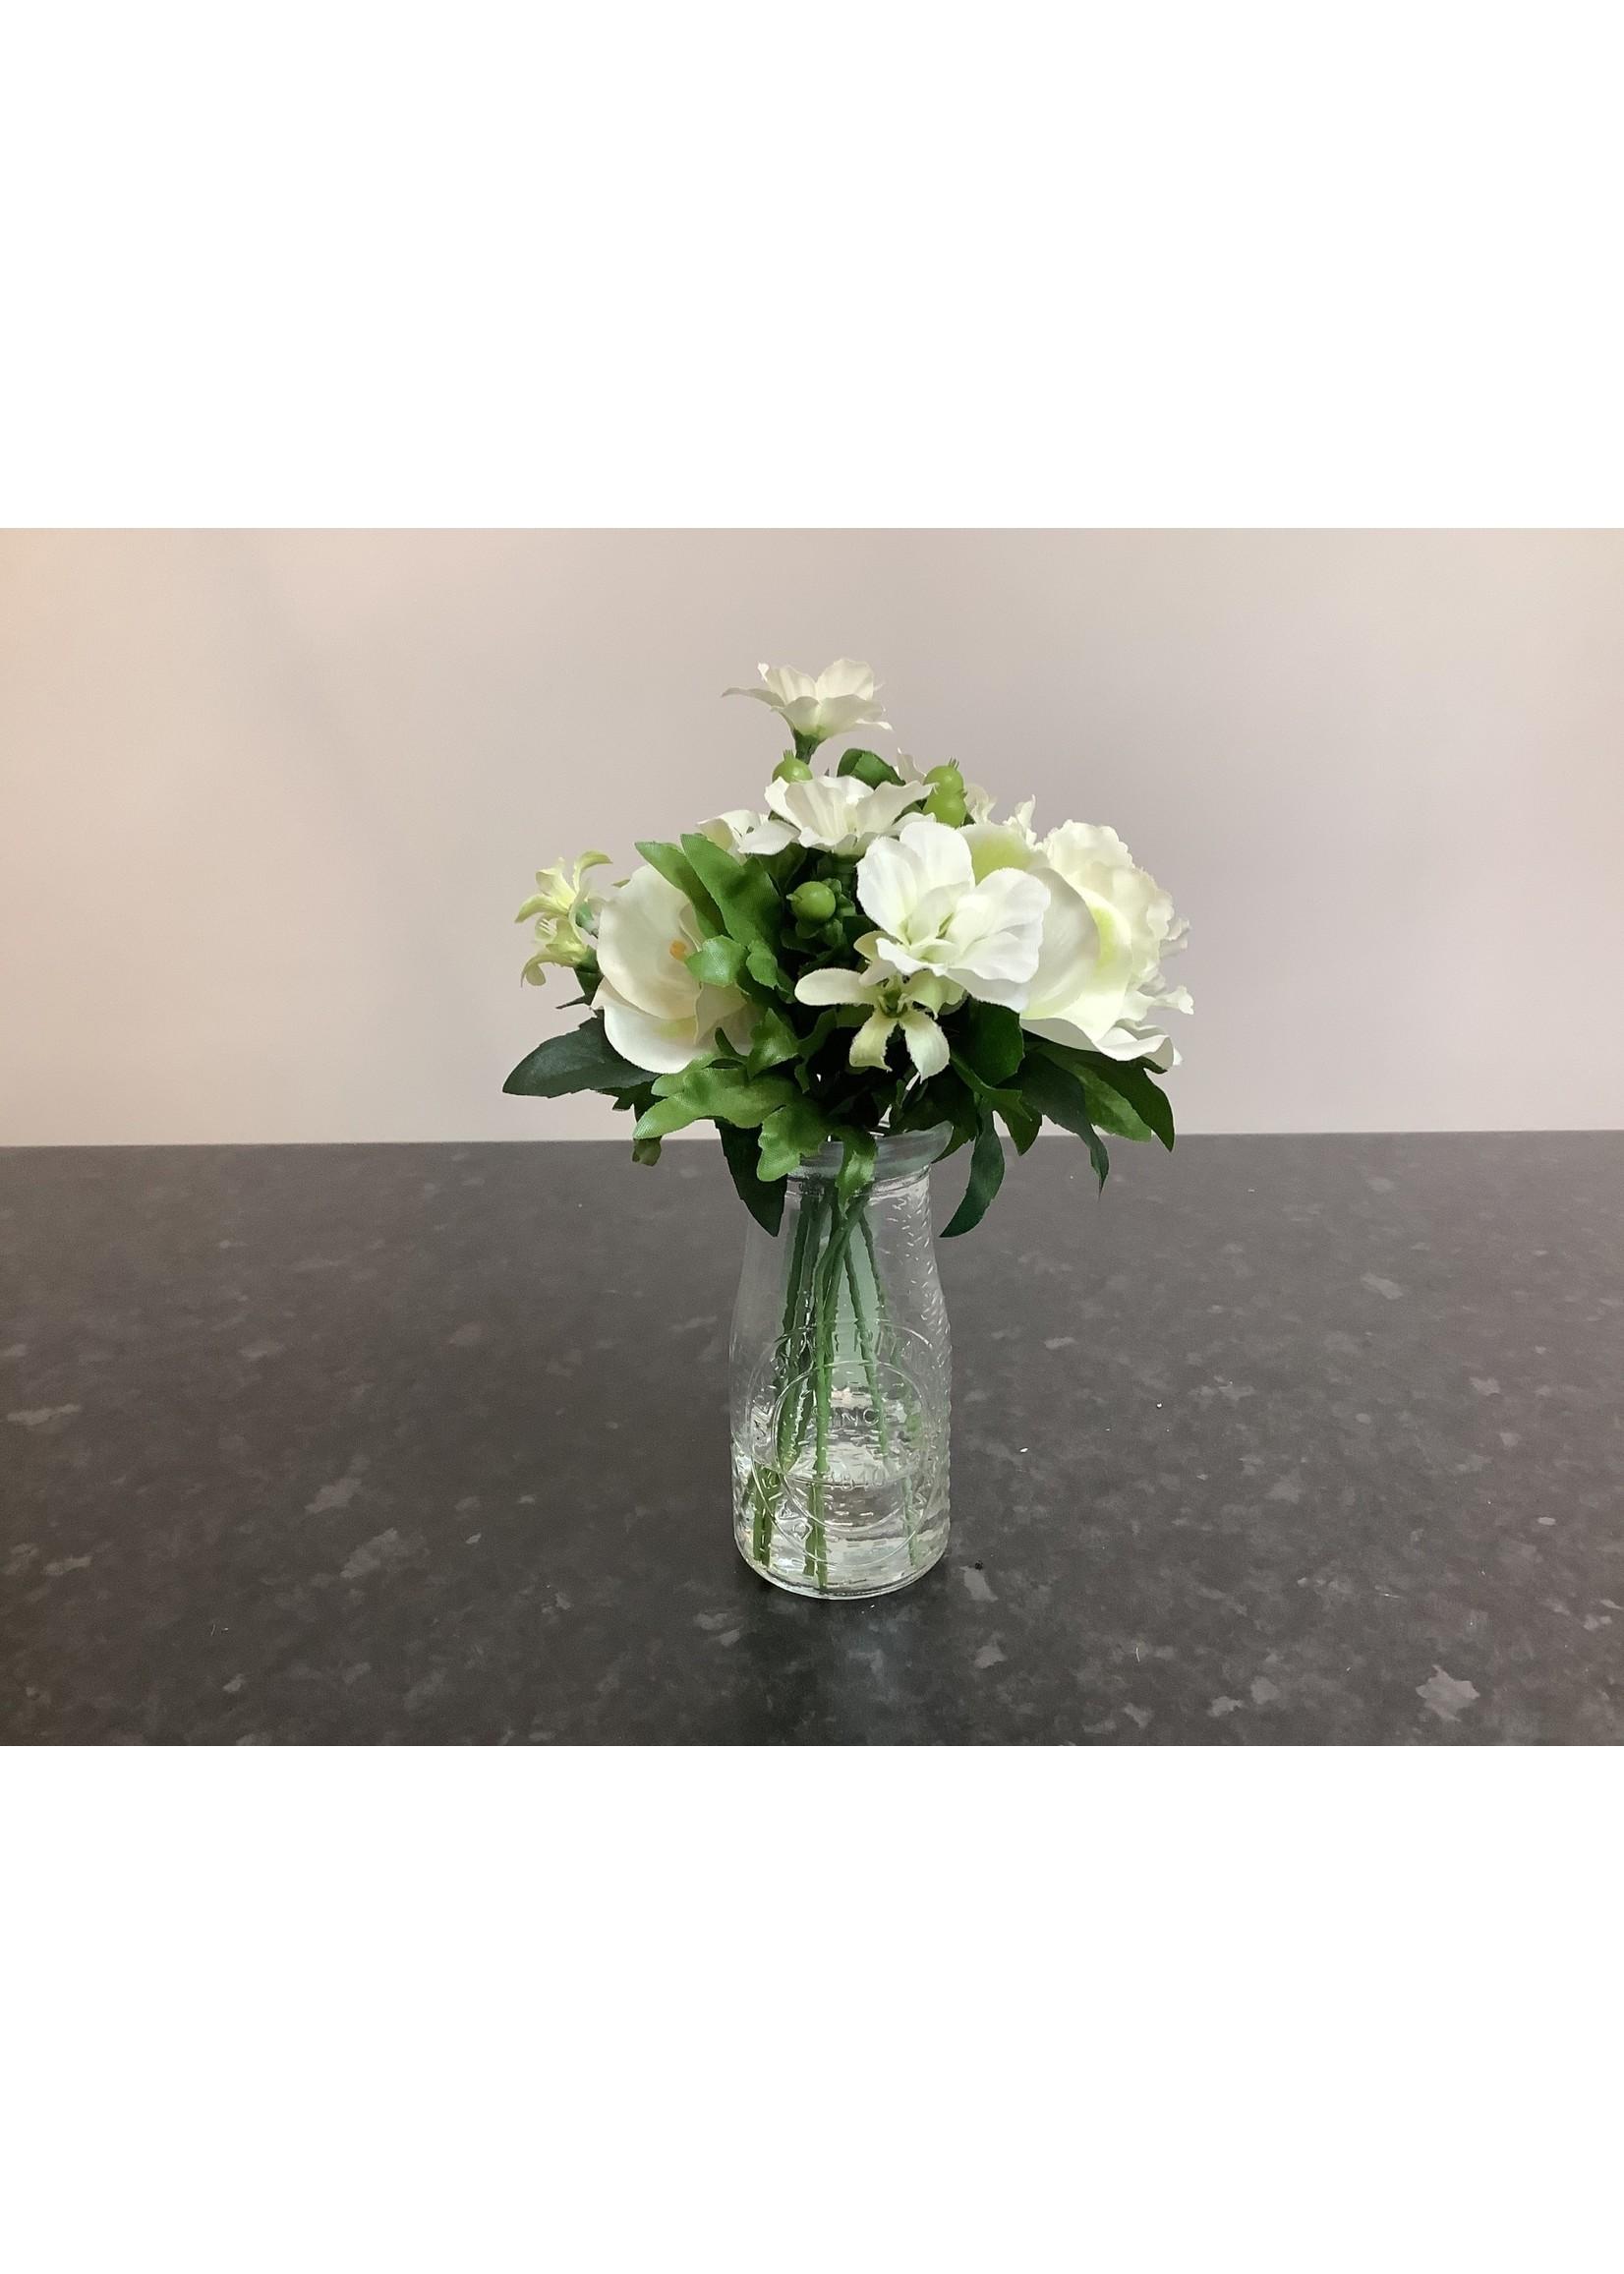 Small flower arrangement in vintage milk bottle  20cm tall